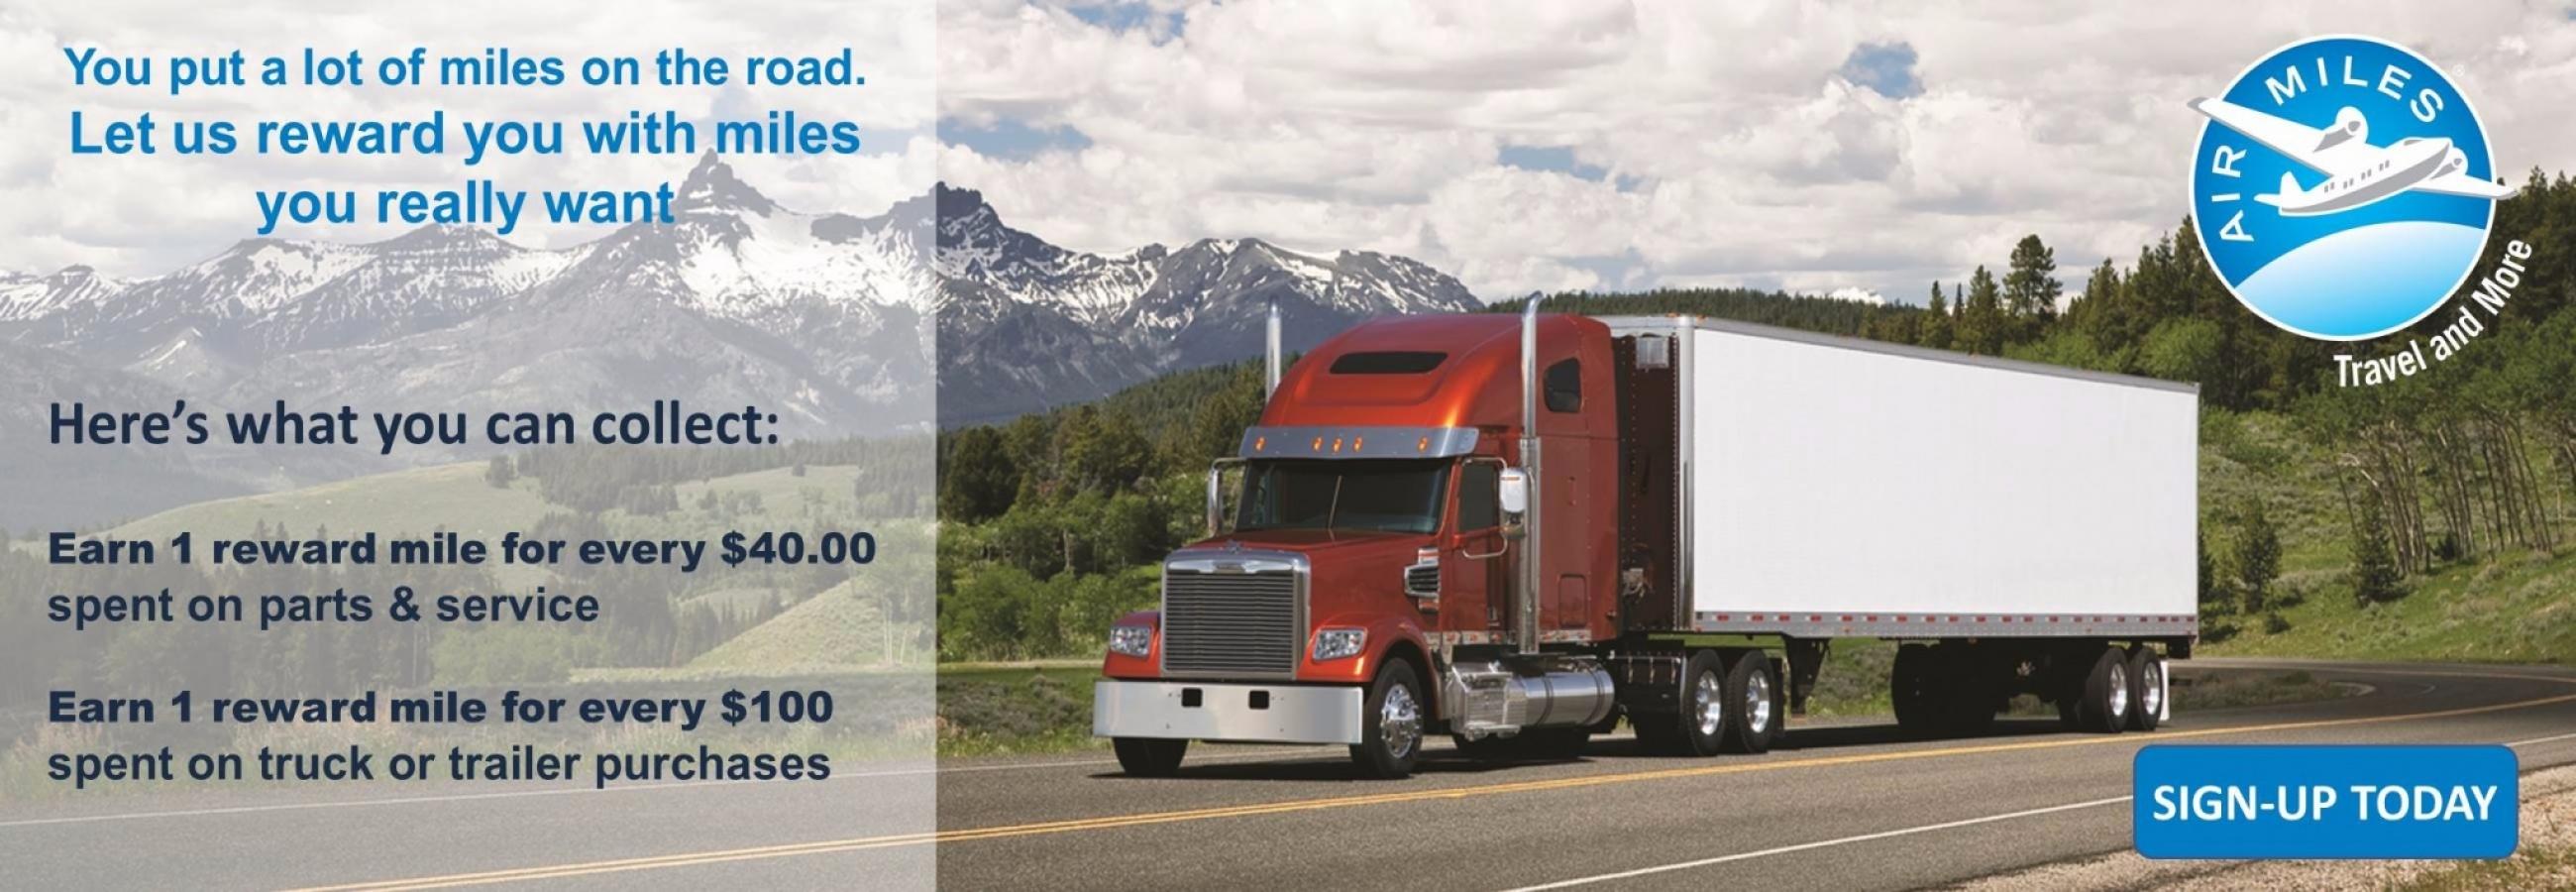 Featured bonus airmiles reward miles offers for January 2016 | Nova Truck Centres